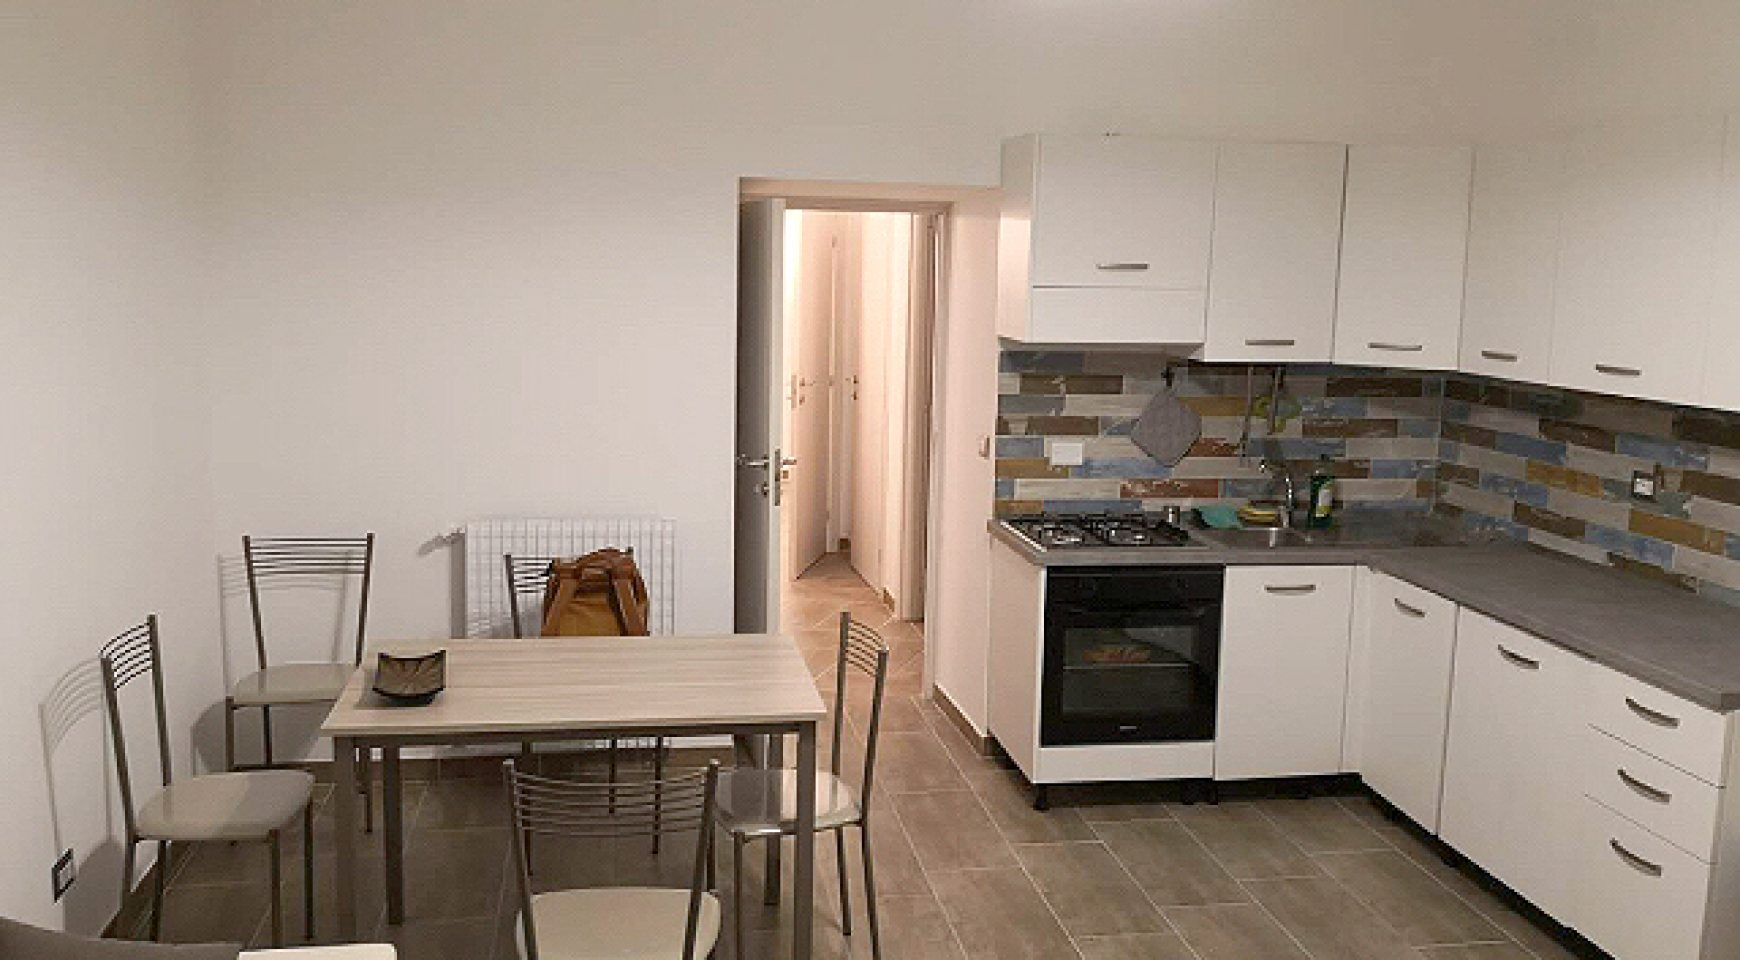 Camera doppia Via Appia Nuova, Roma - (RM) - NoAgenzie